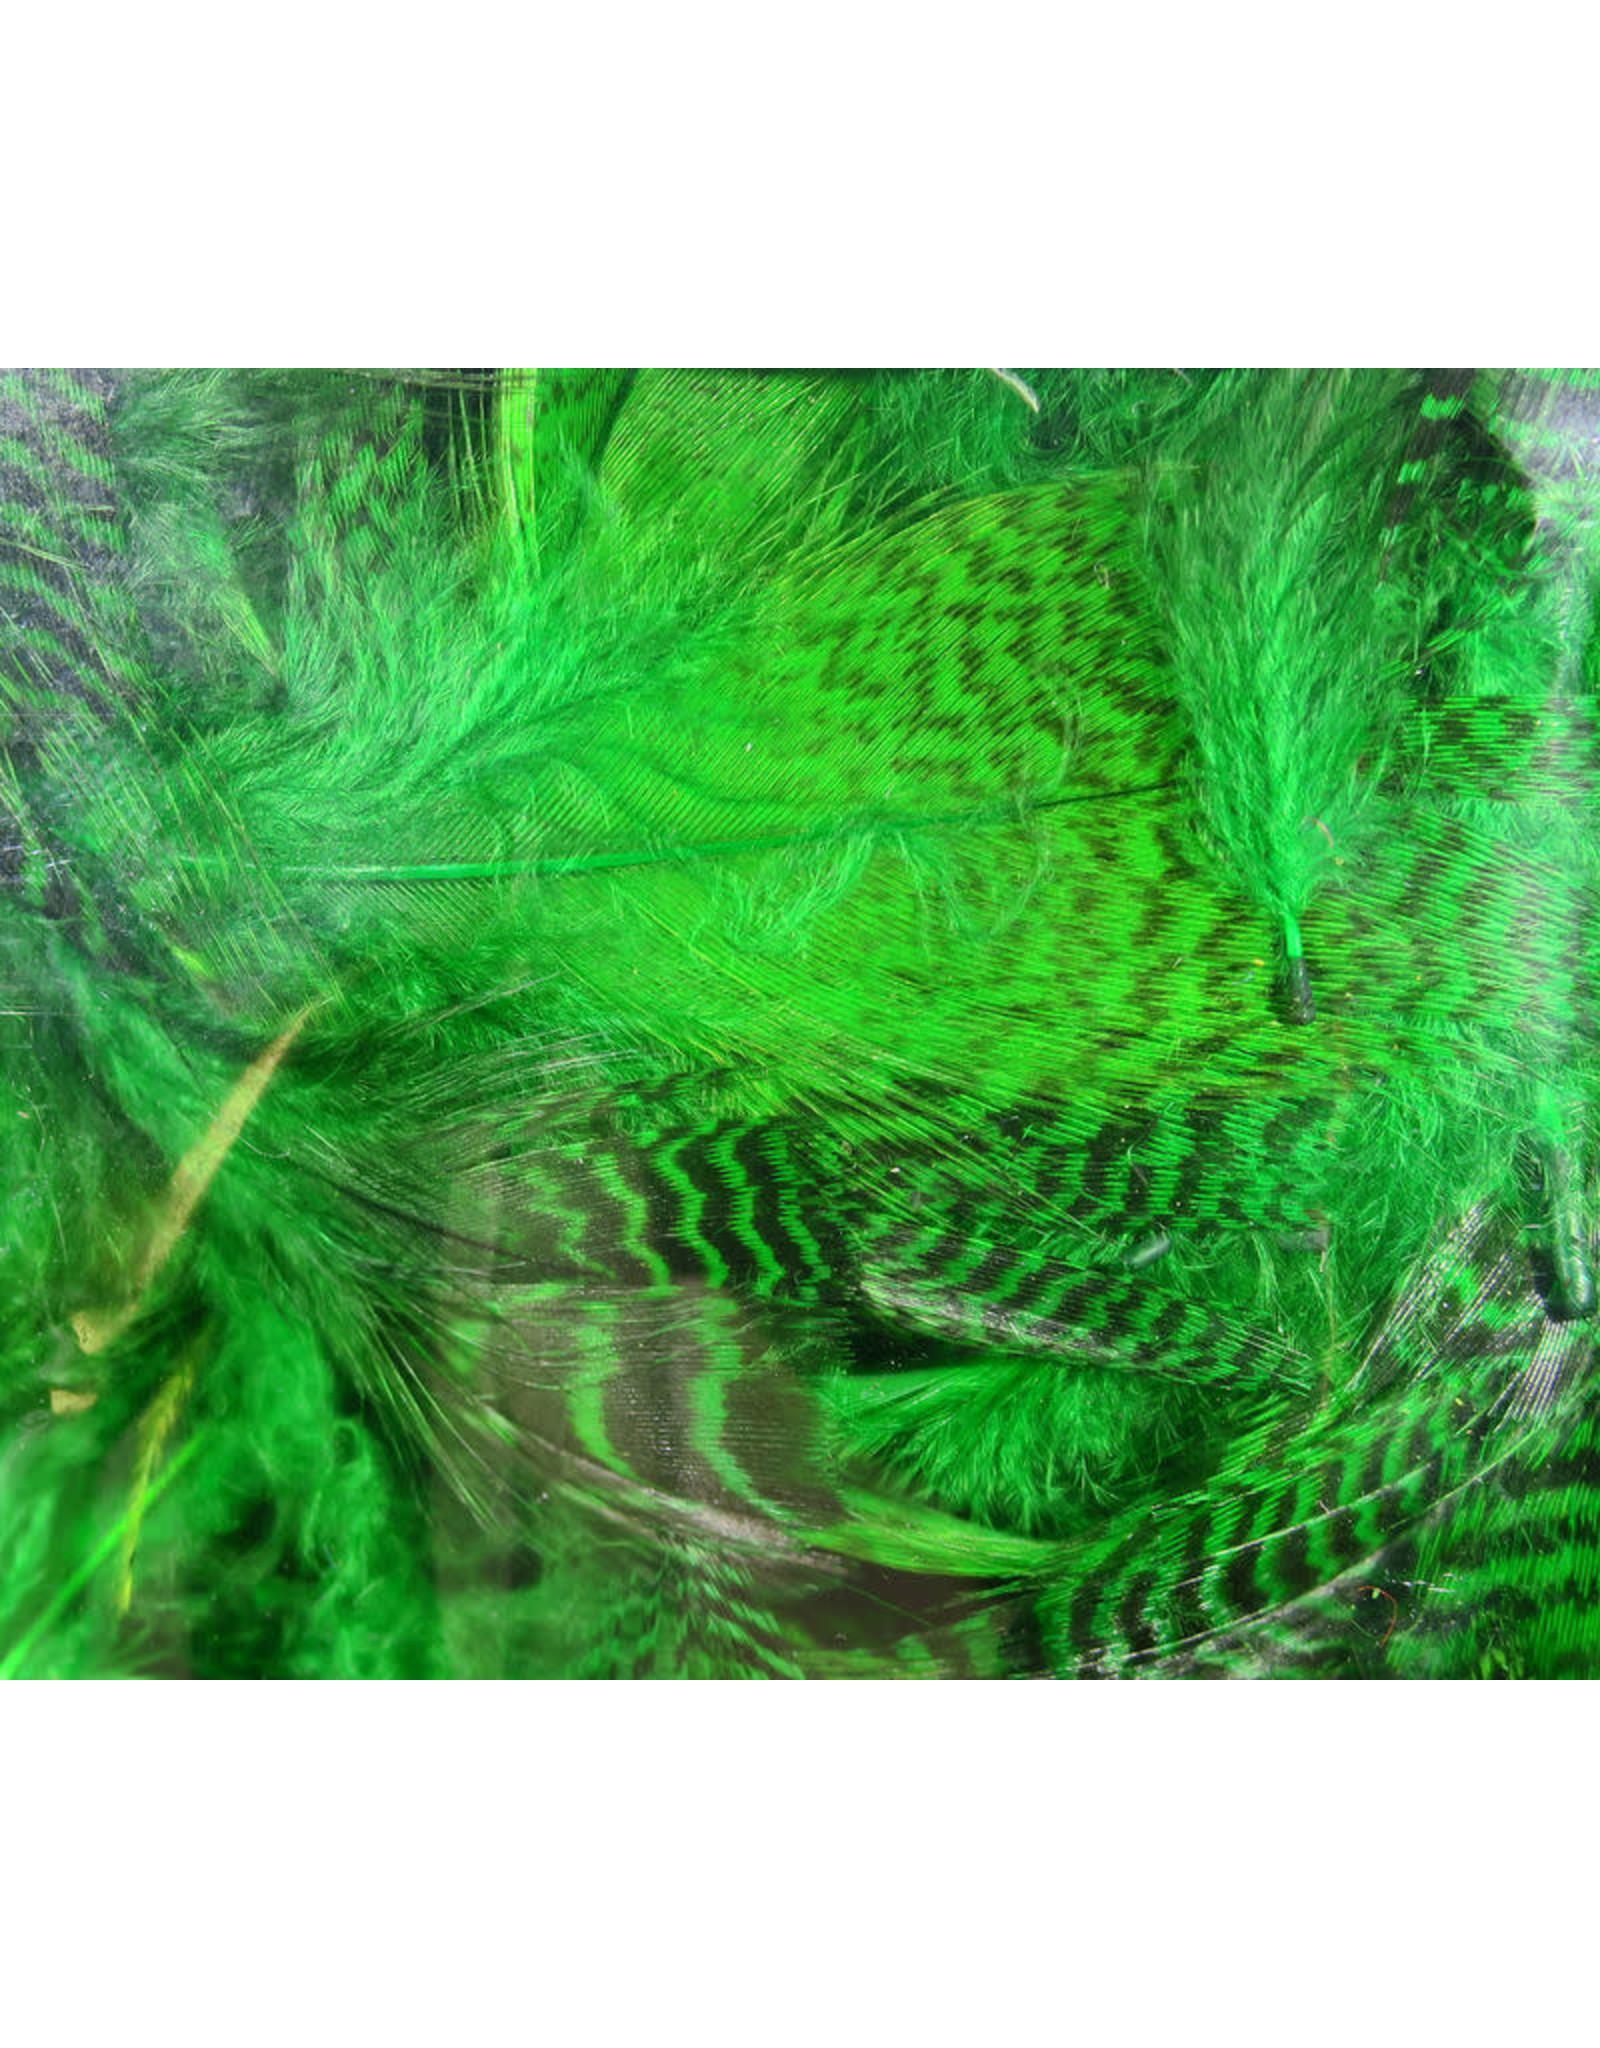 Hareline Hareline Teal Flank Feathers